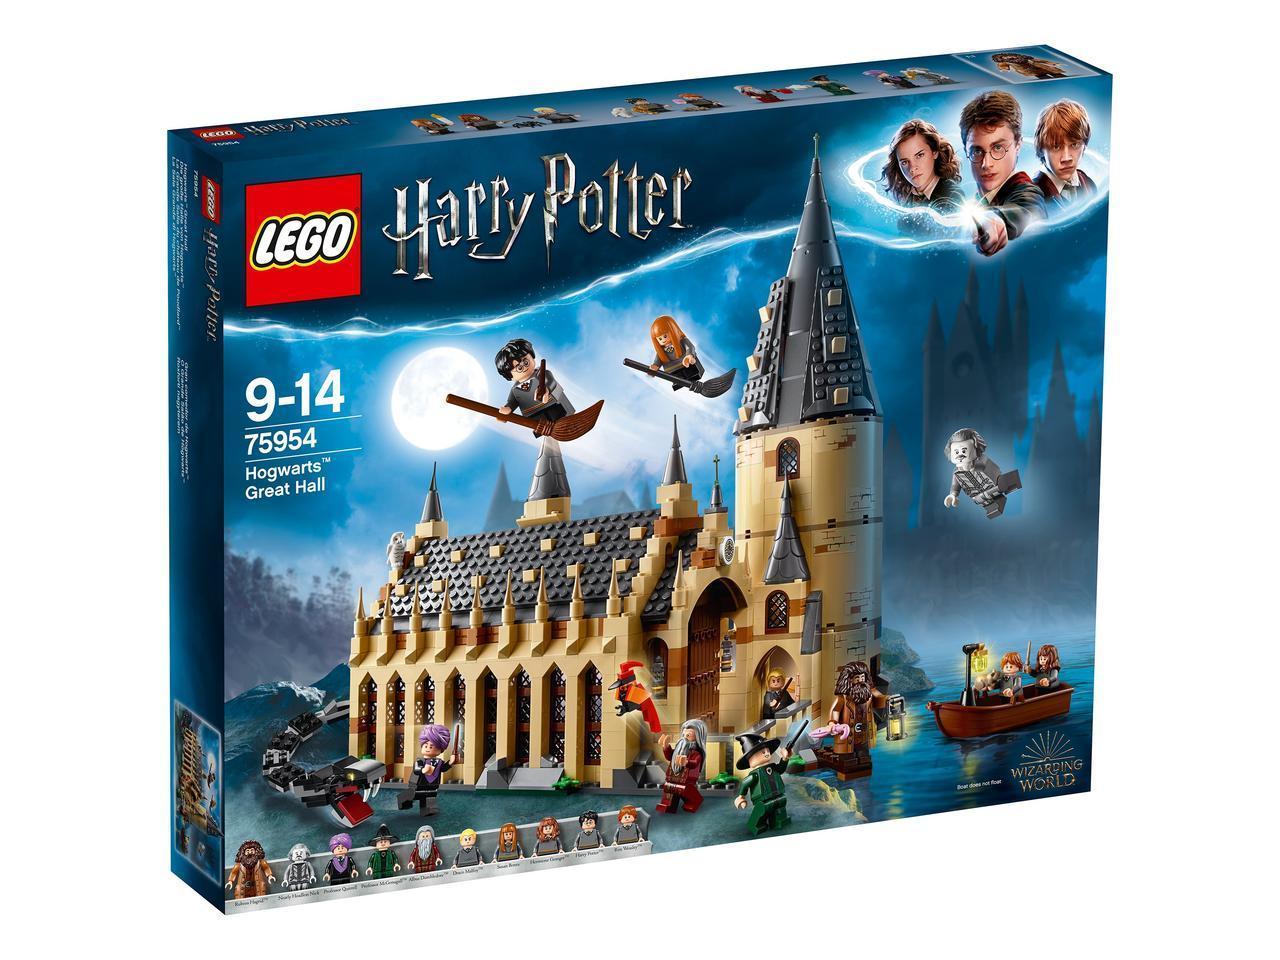 75954 Lego Harry Potter Большой зал Хогвартса, Лего Гарри Поттер